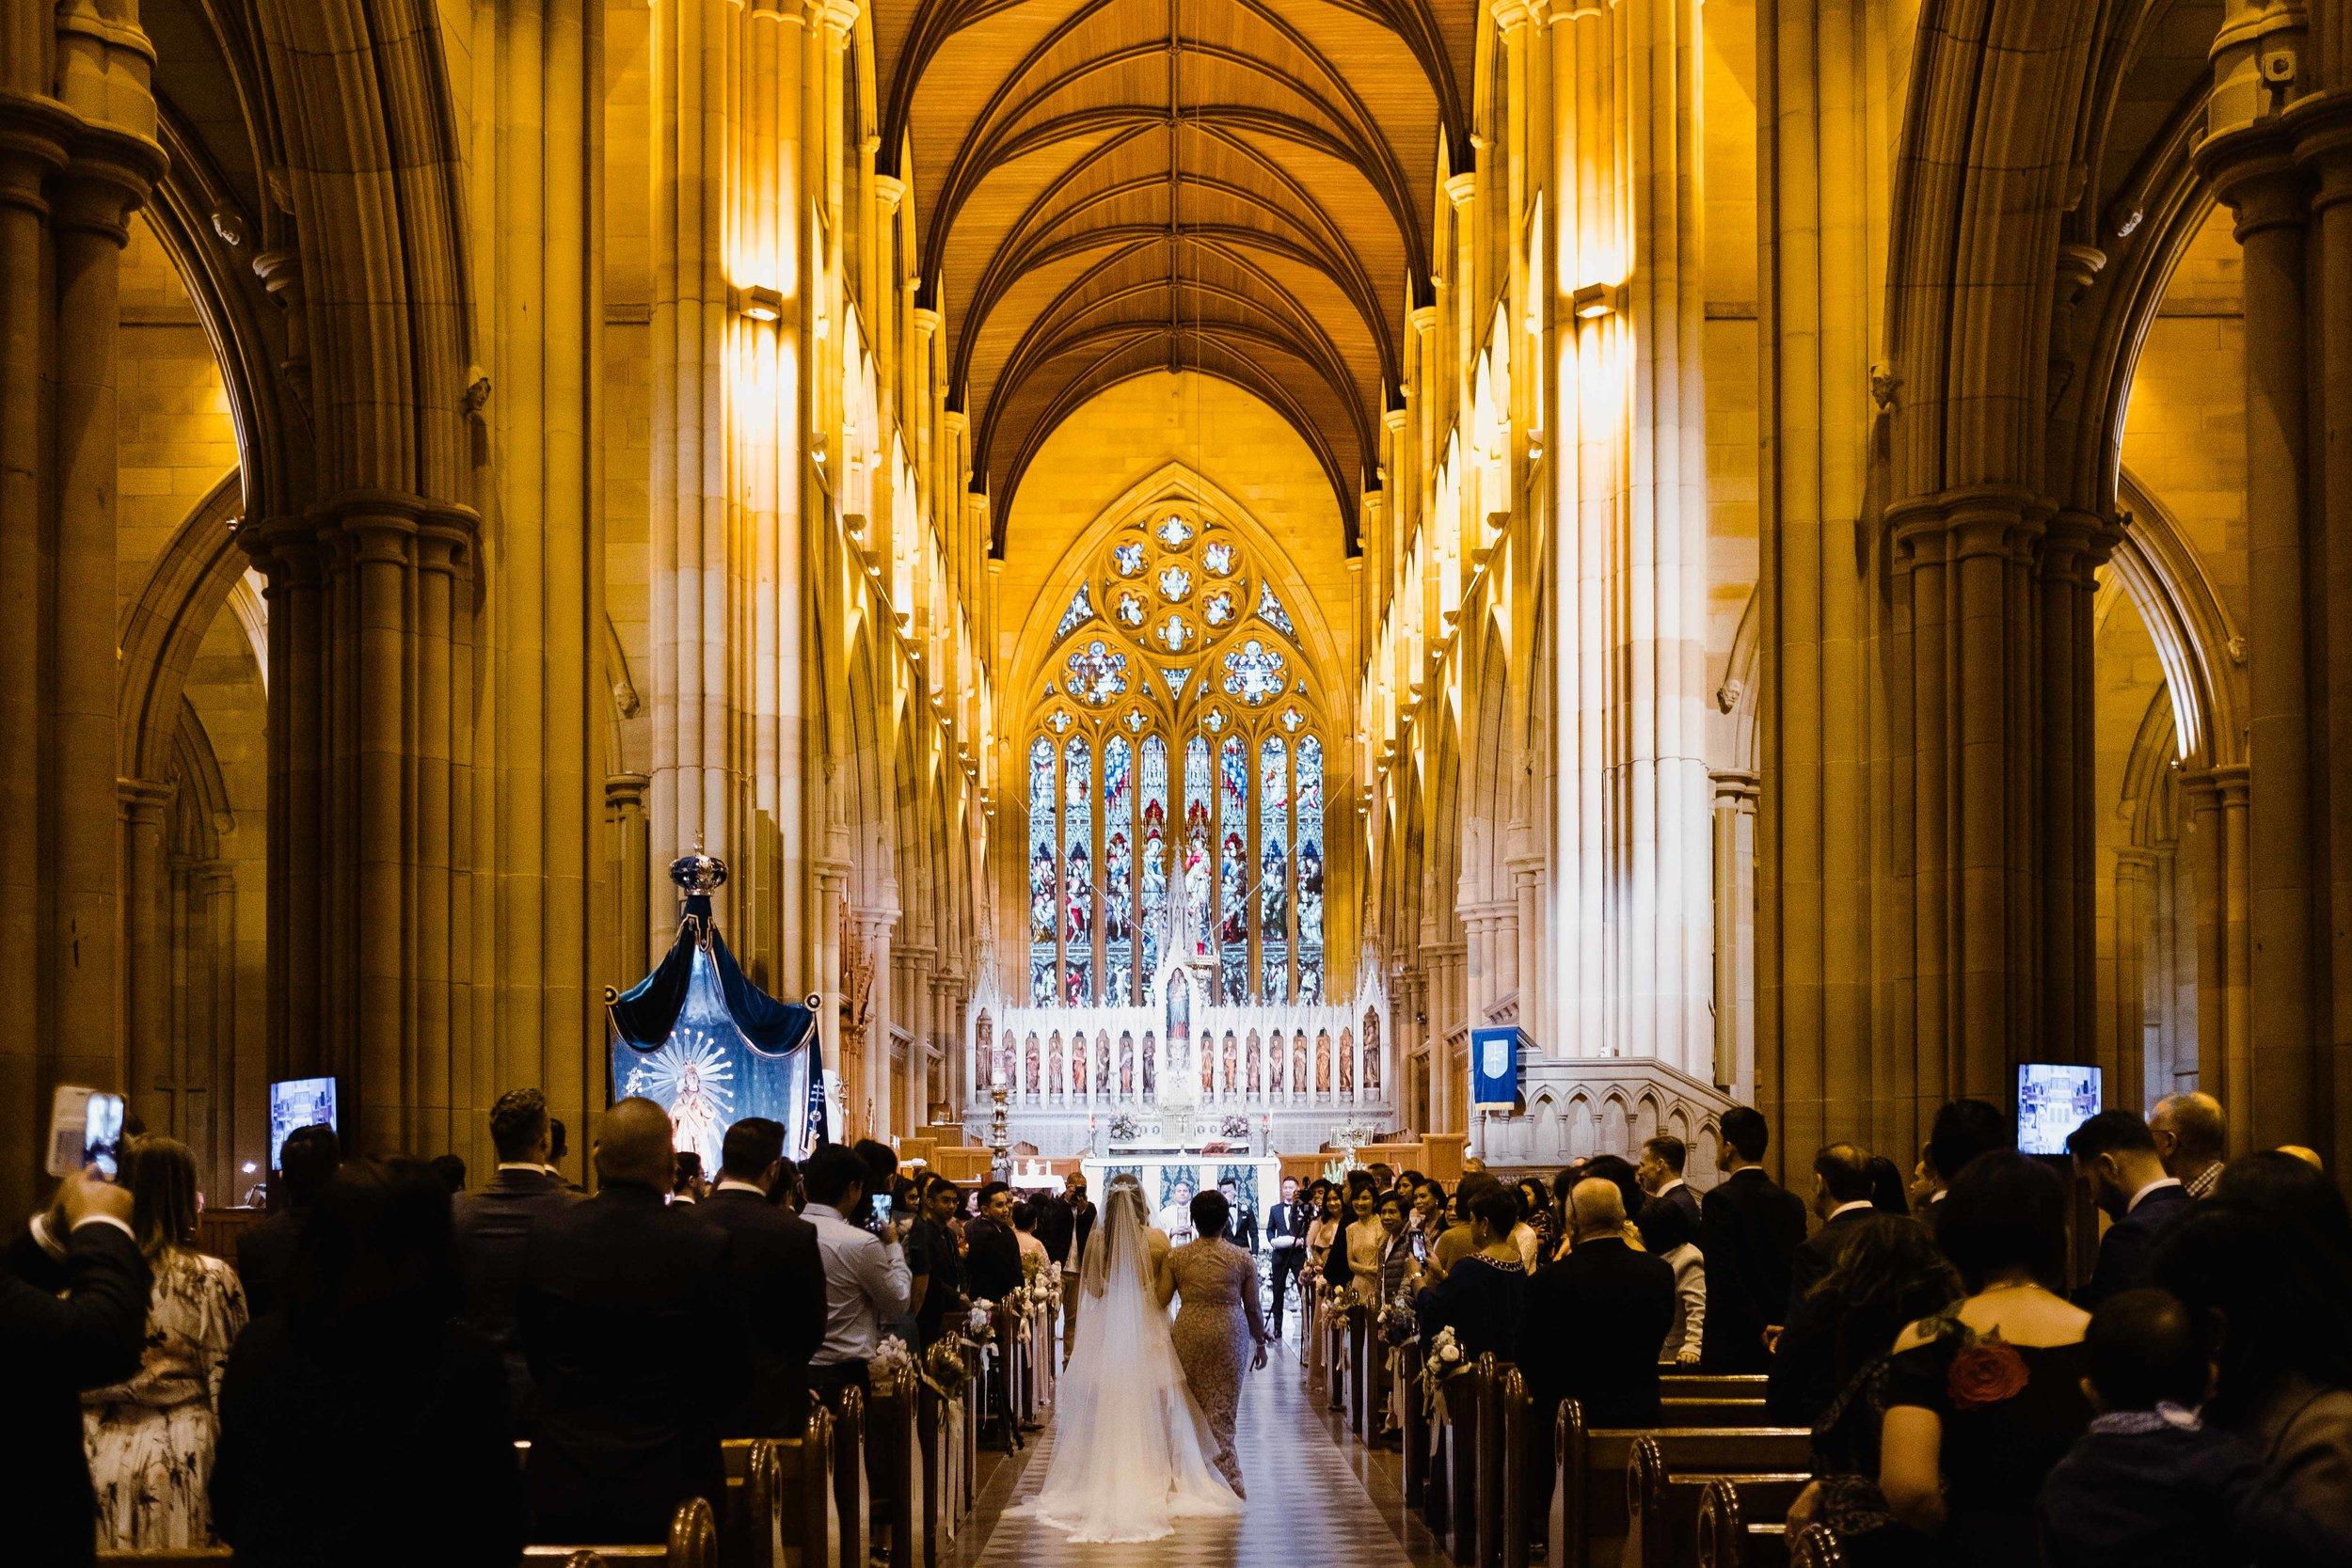 Maria and Gerald Sydney wedding by Milton Gan Photography 13.jpg